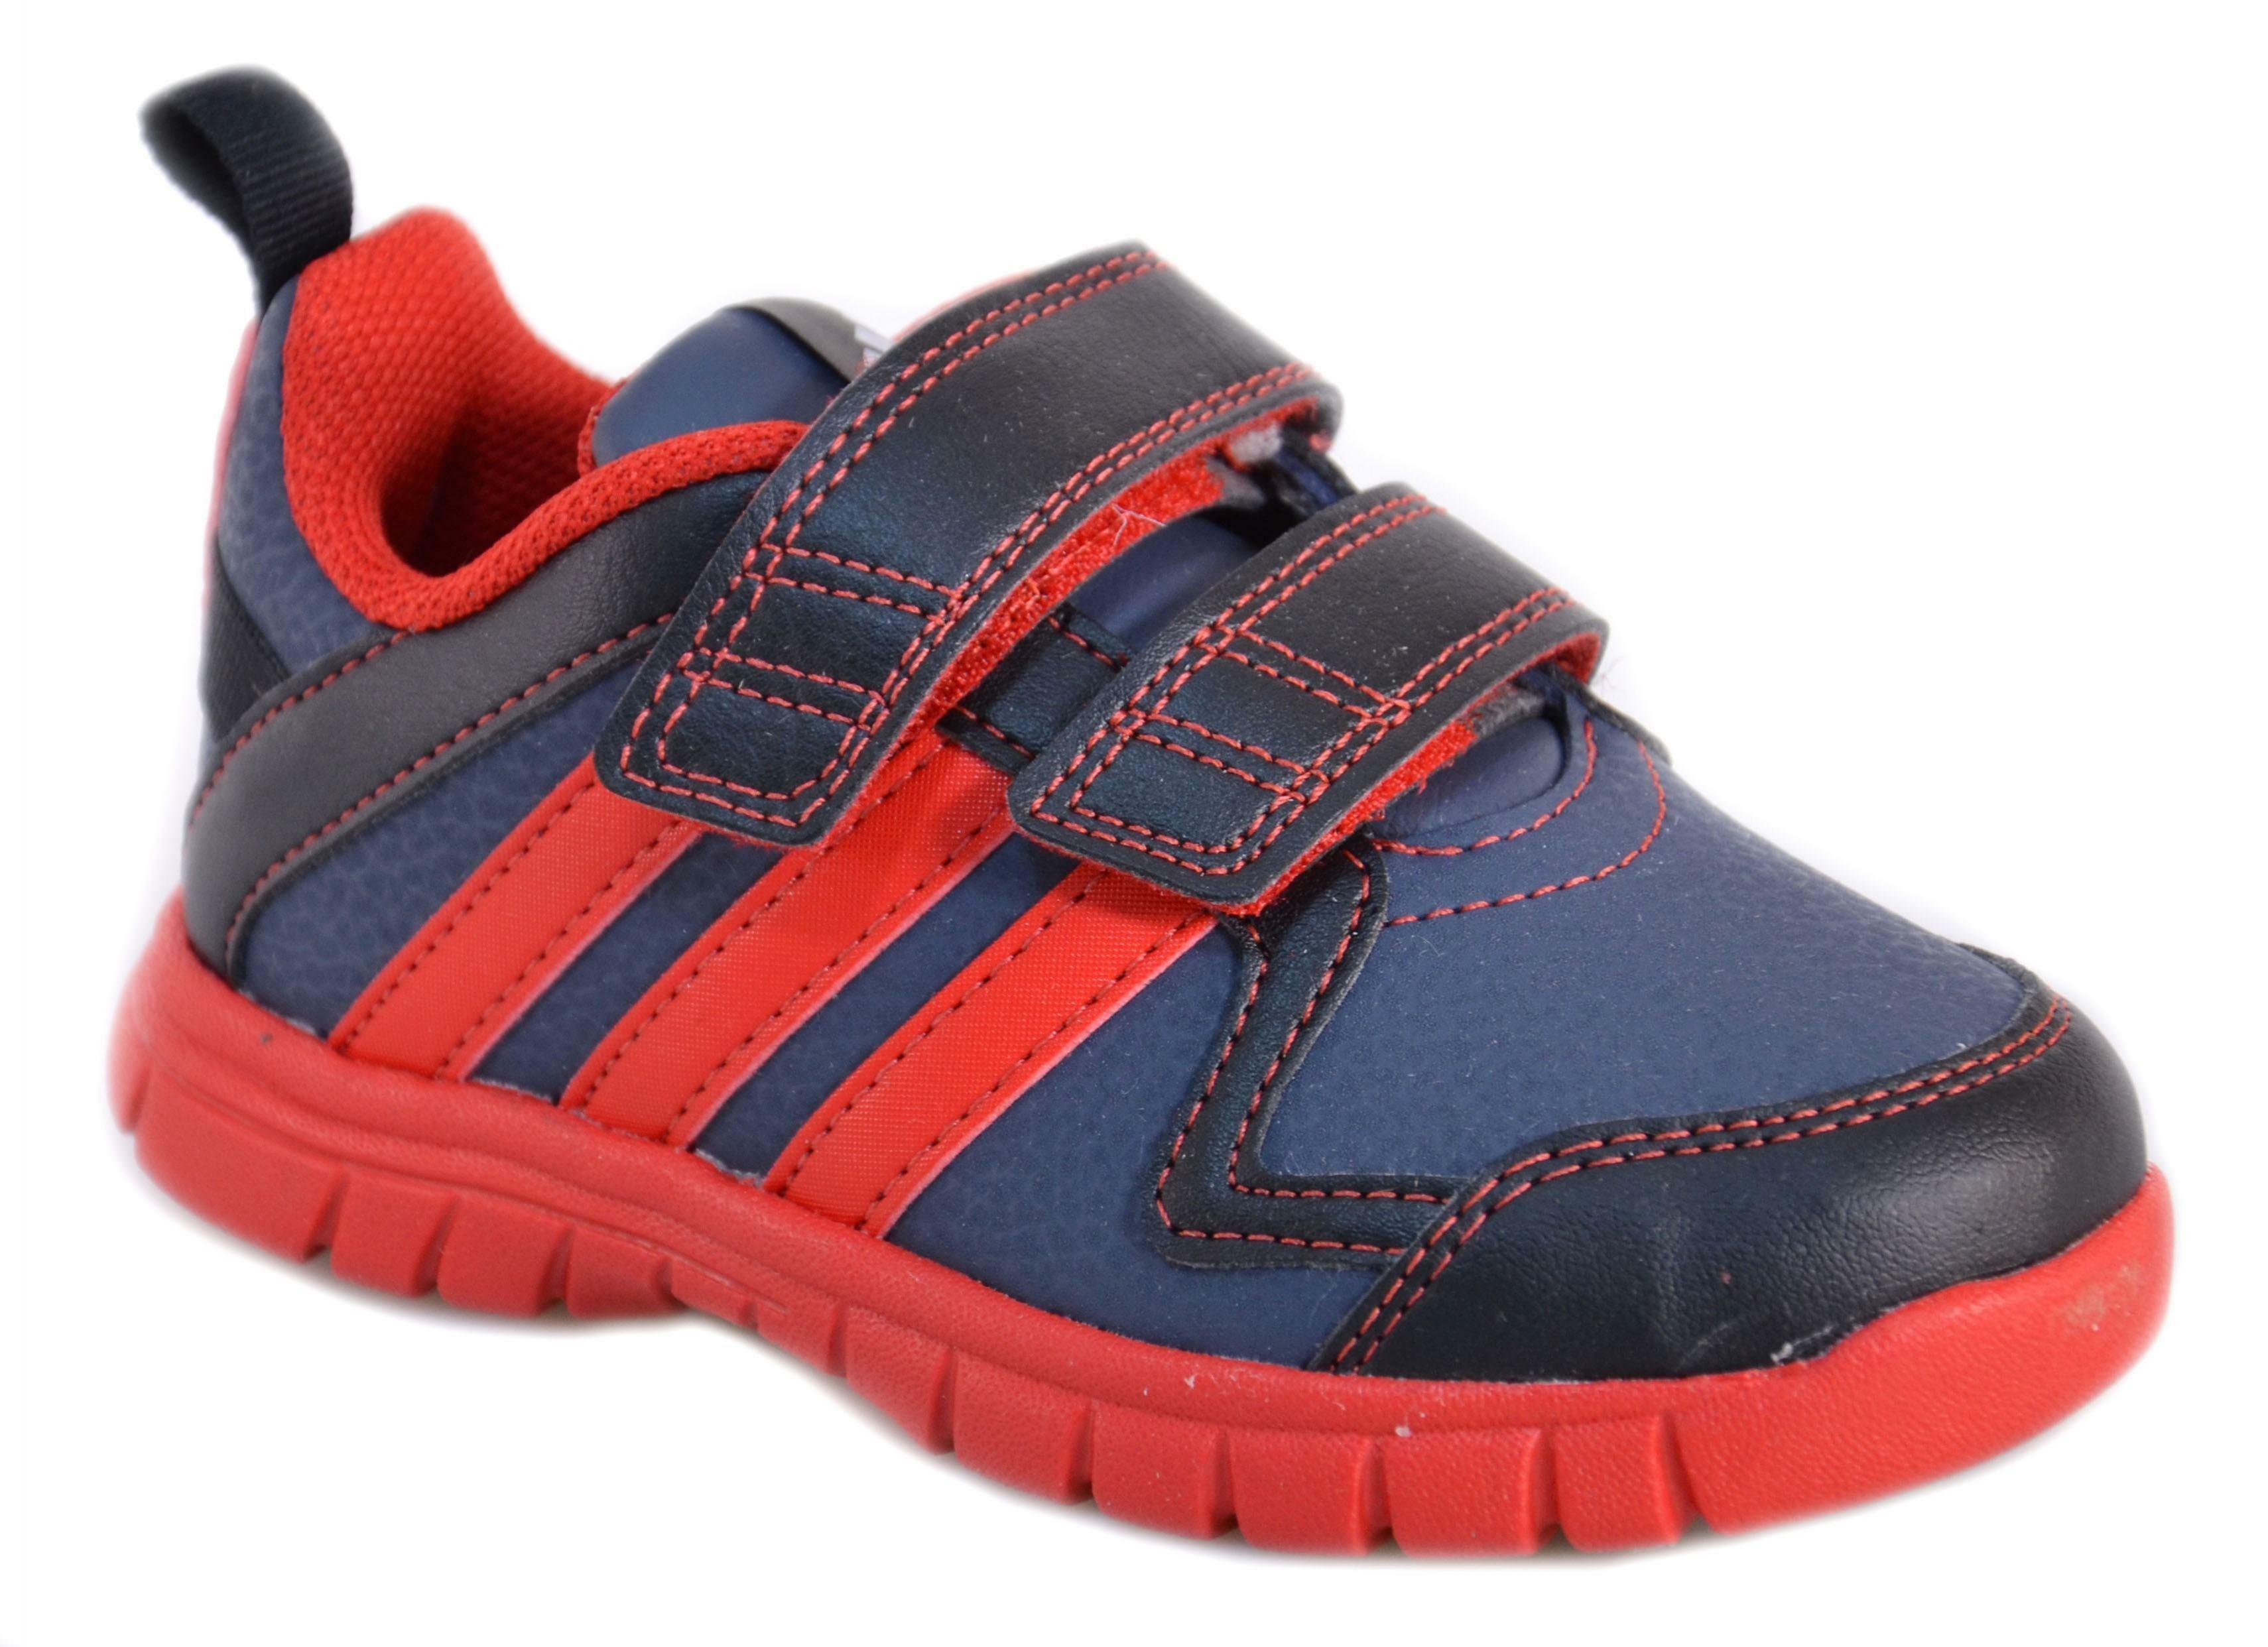 scarpe bambino 3 anni adidas